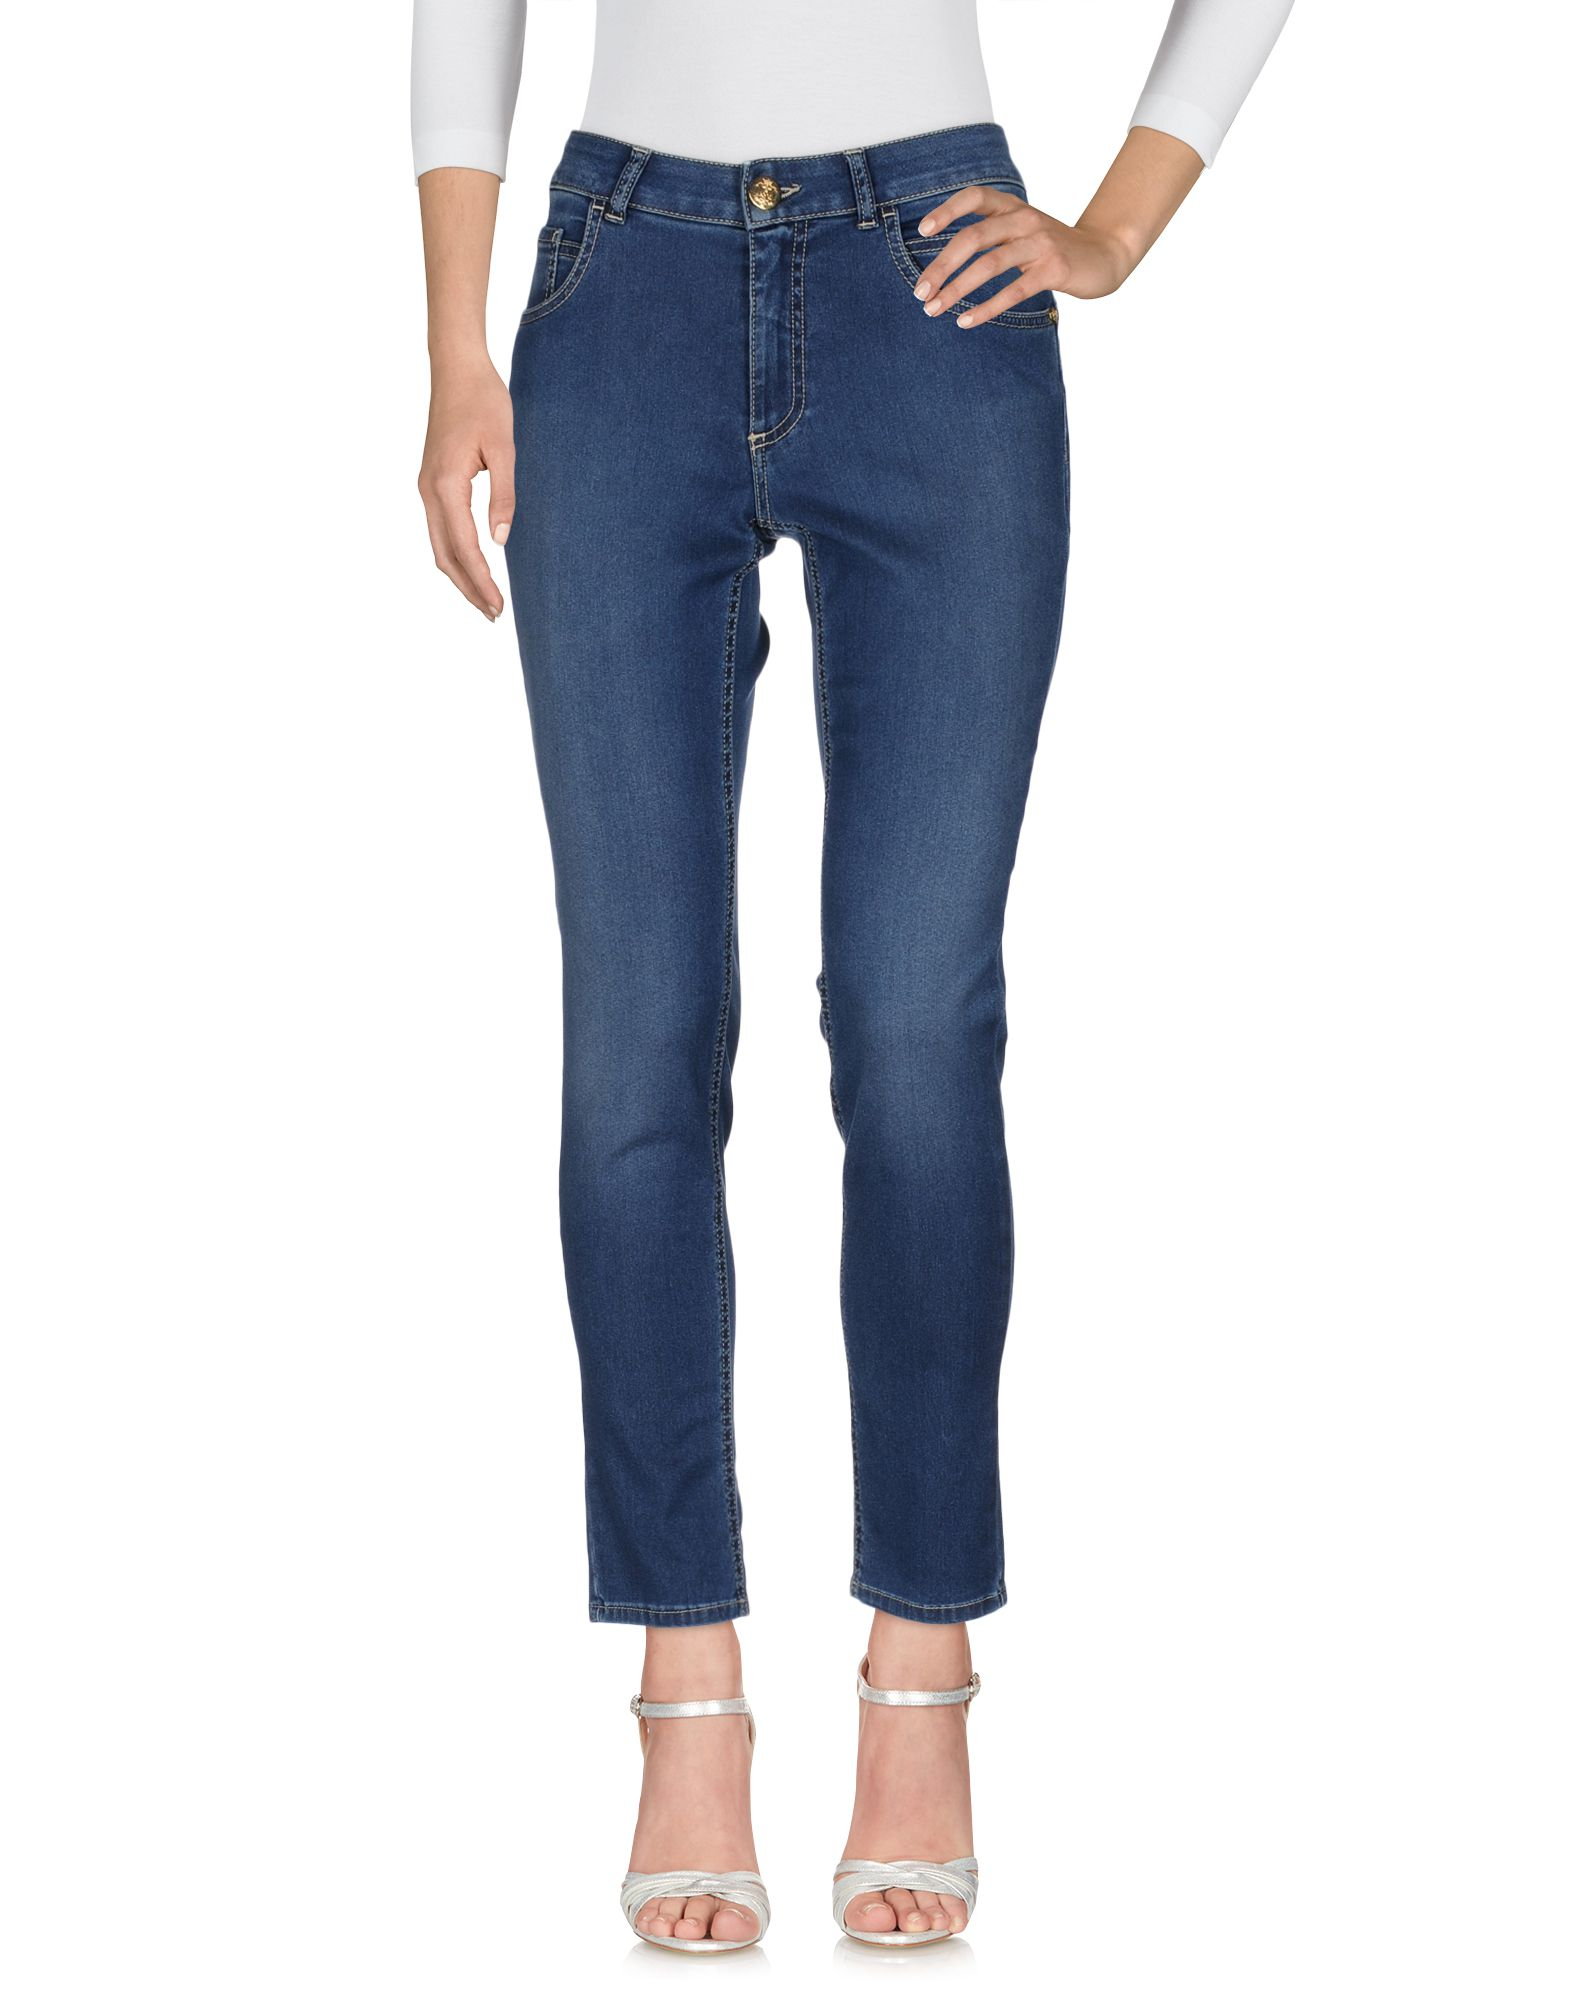 Pantaloni Jeans Marani Jeans Donna - Acquista online su A5HRgf4